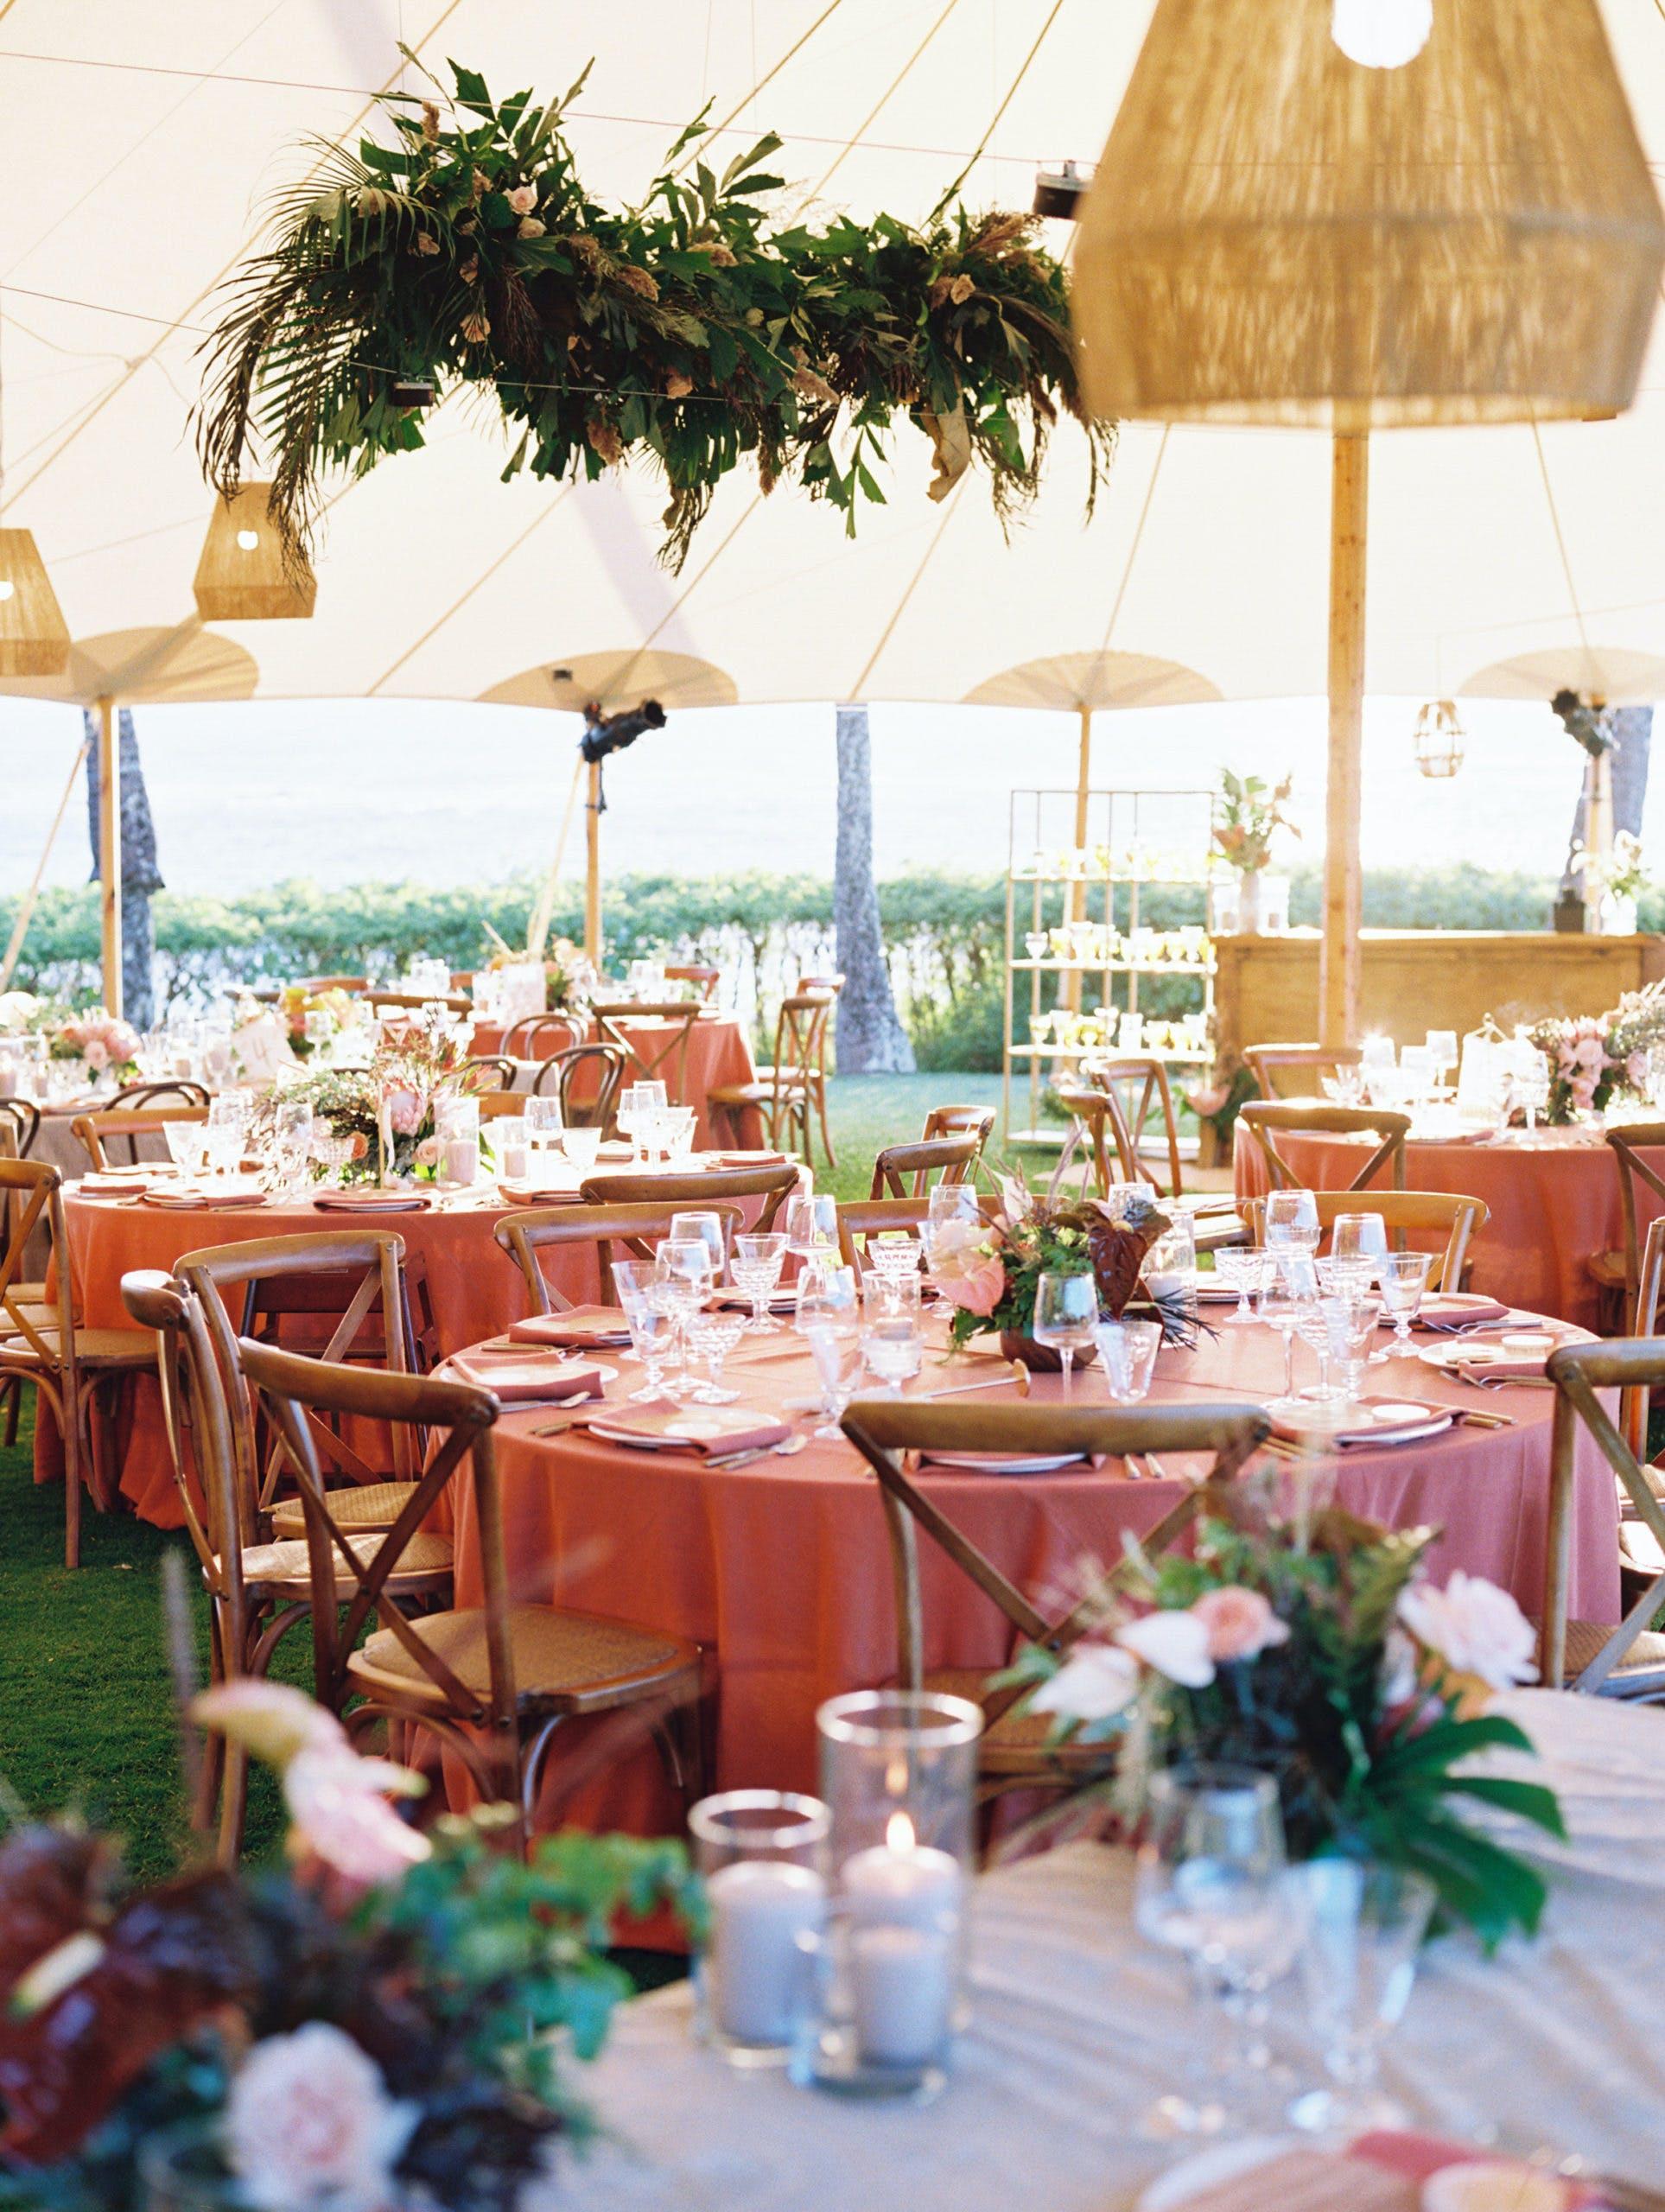 Dreamy Boho Wedding at Montage Kapalua Bay in Kapalua, HI